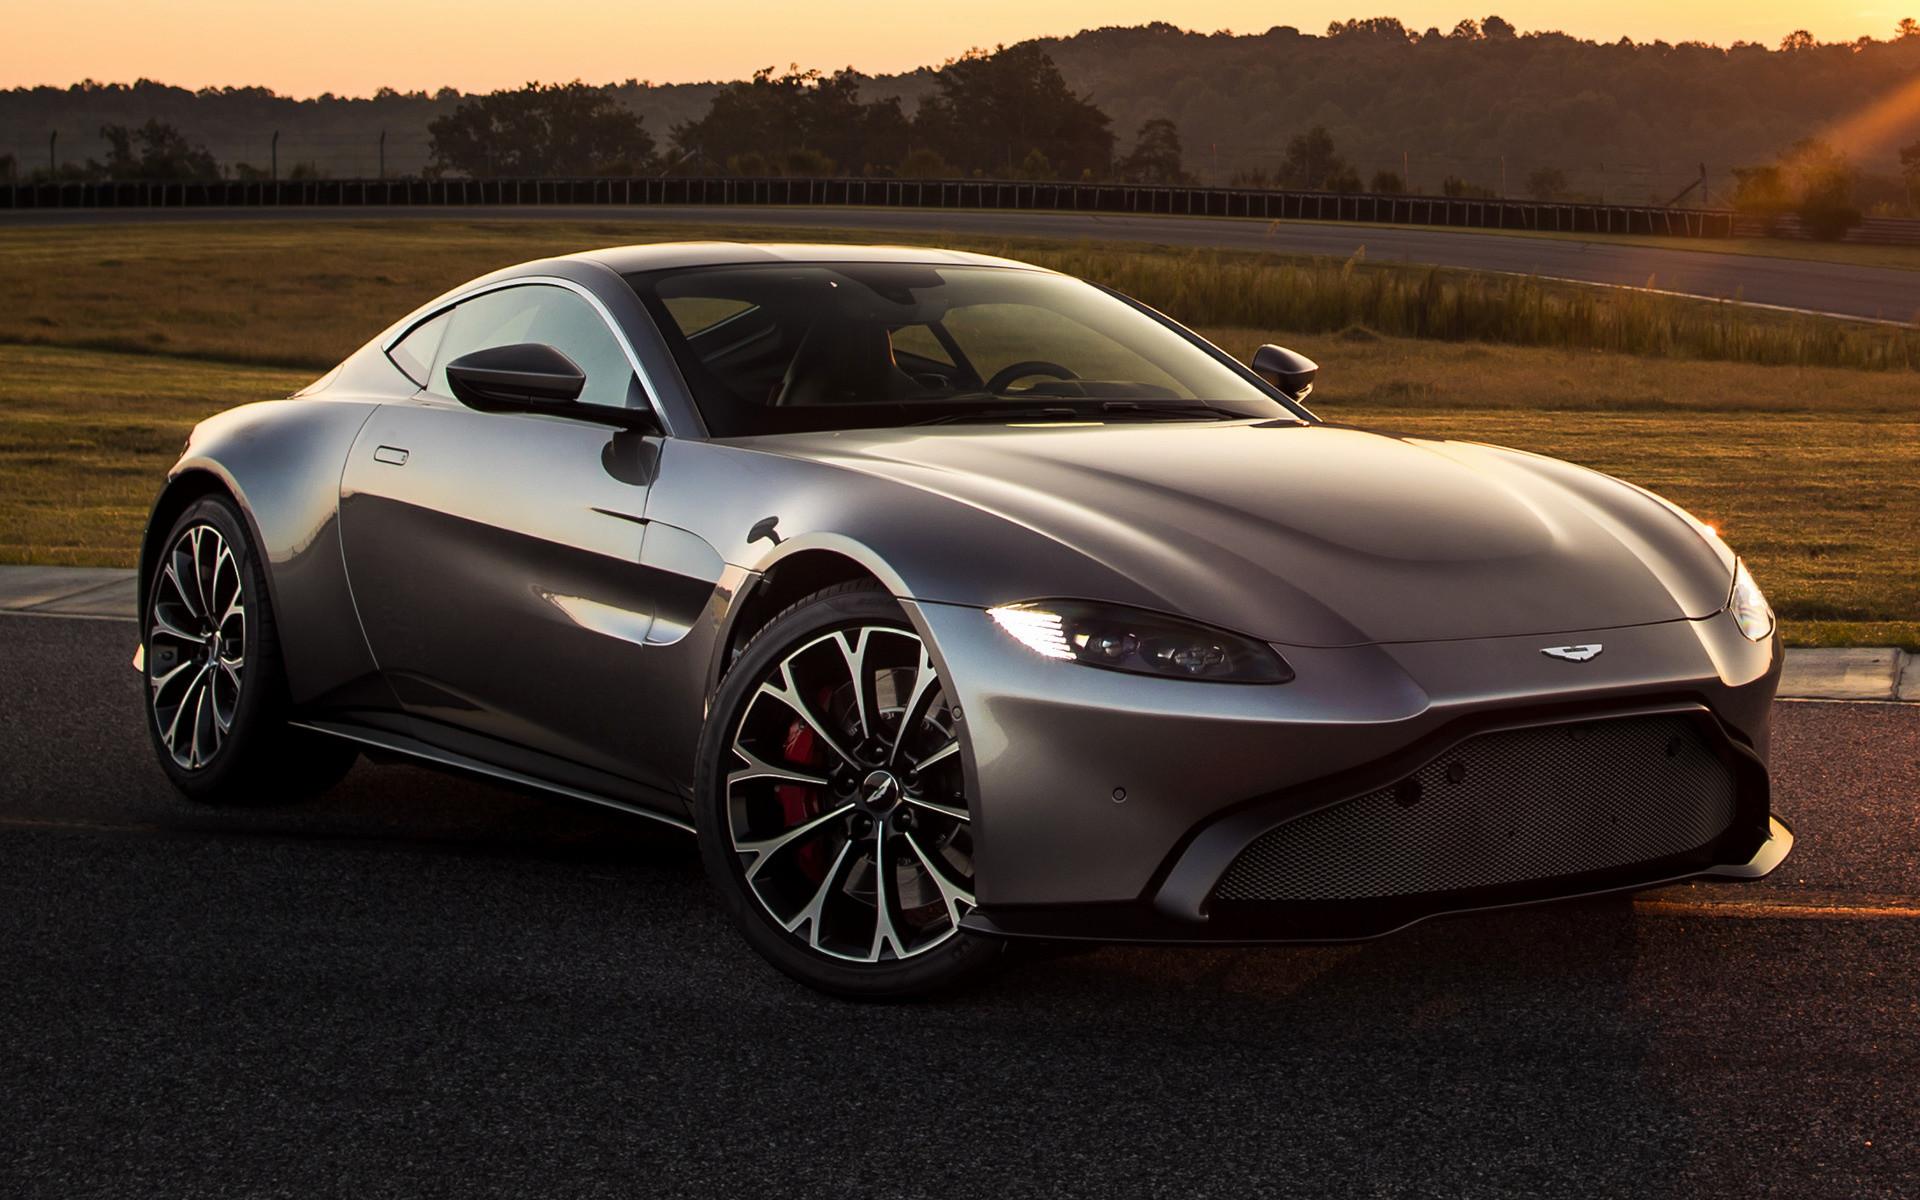 Aston Martin Vanquish 2018 Wallpaper (62+ Images